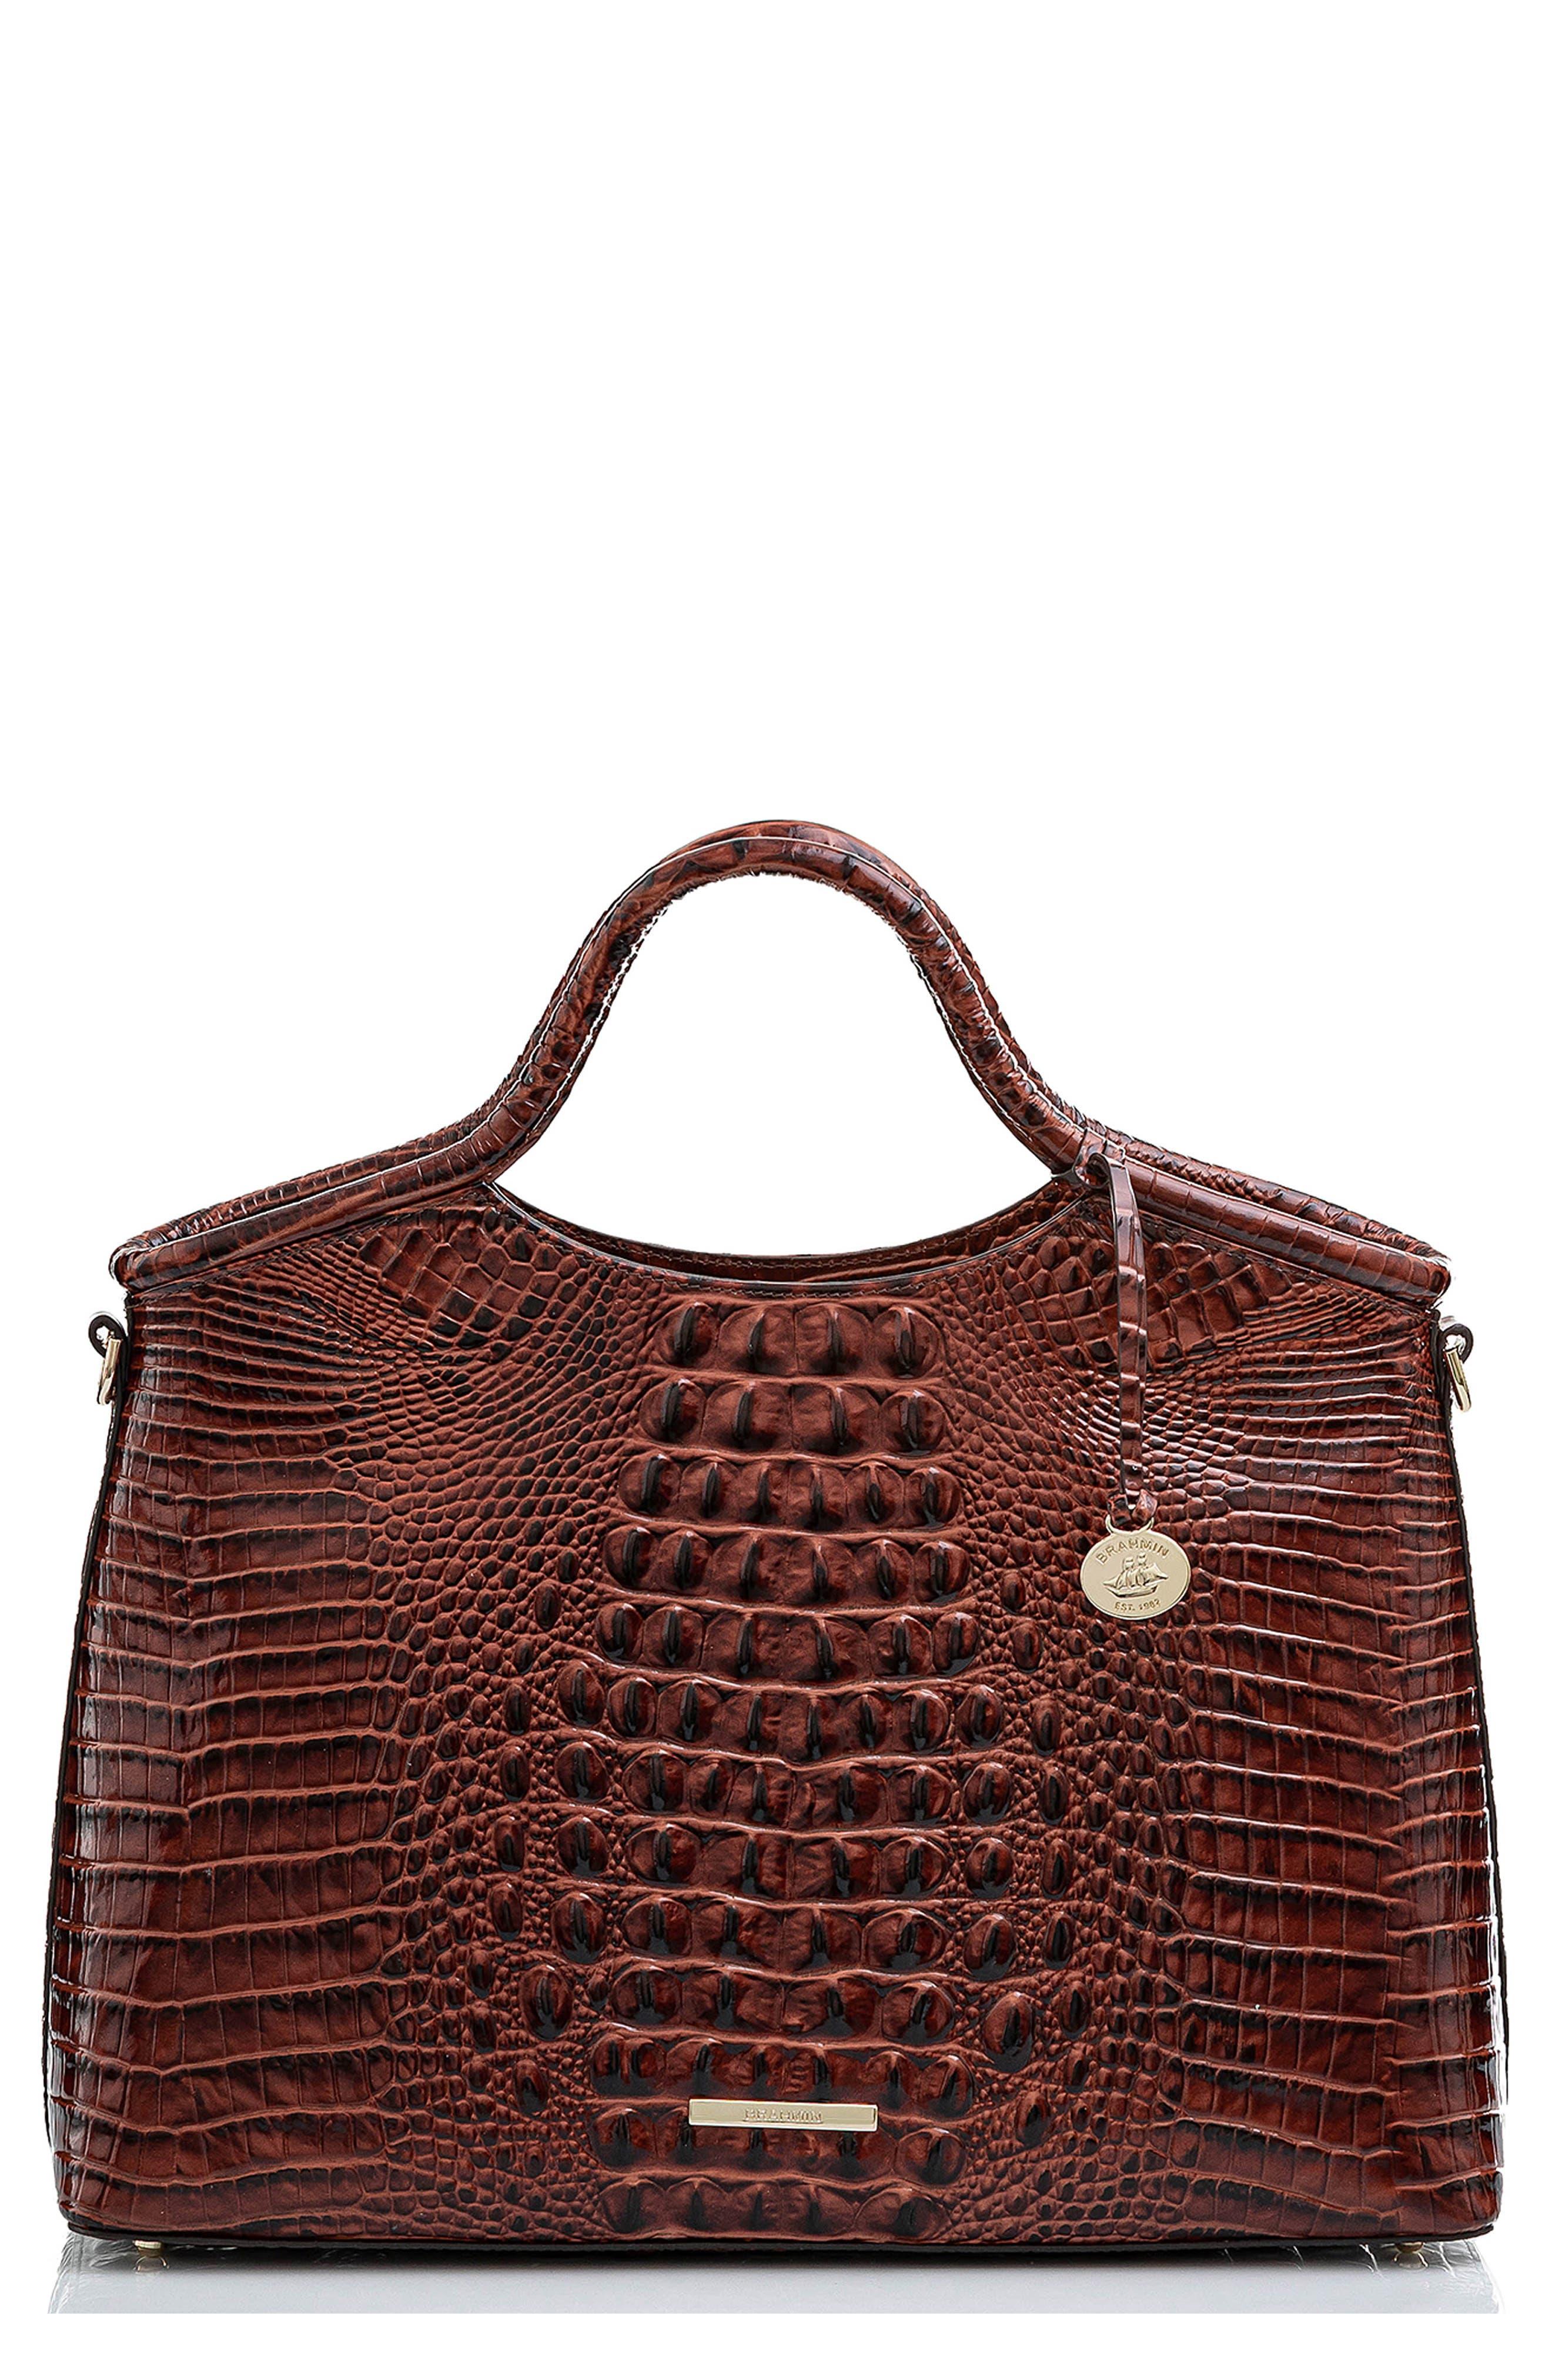 Elaine Croc Embossed Leather Satchel